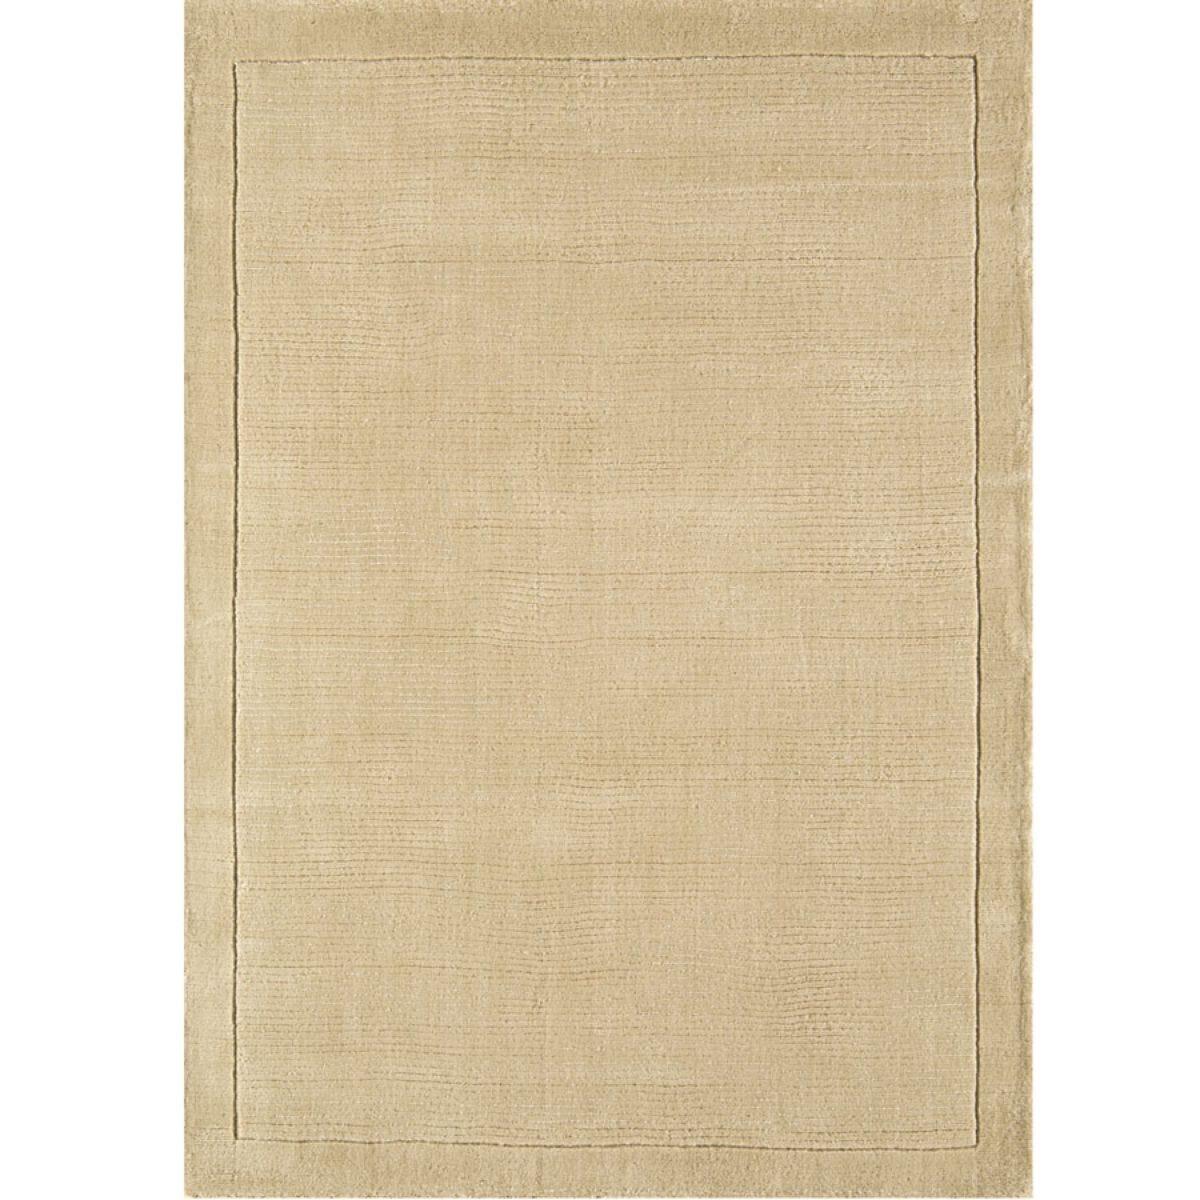 Asiatic York Rug, 80 x 150cm - Beige